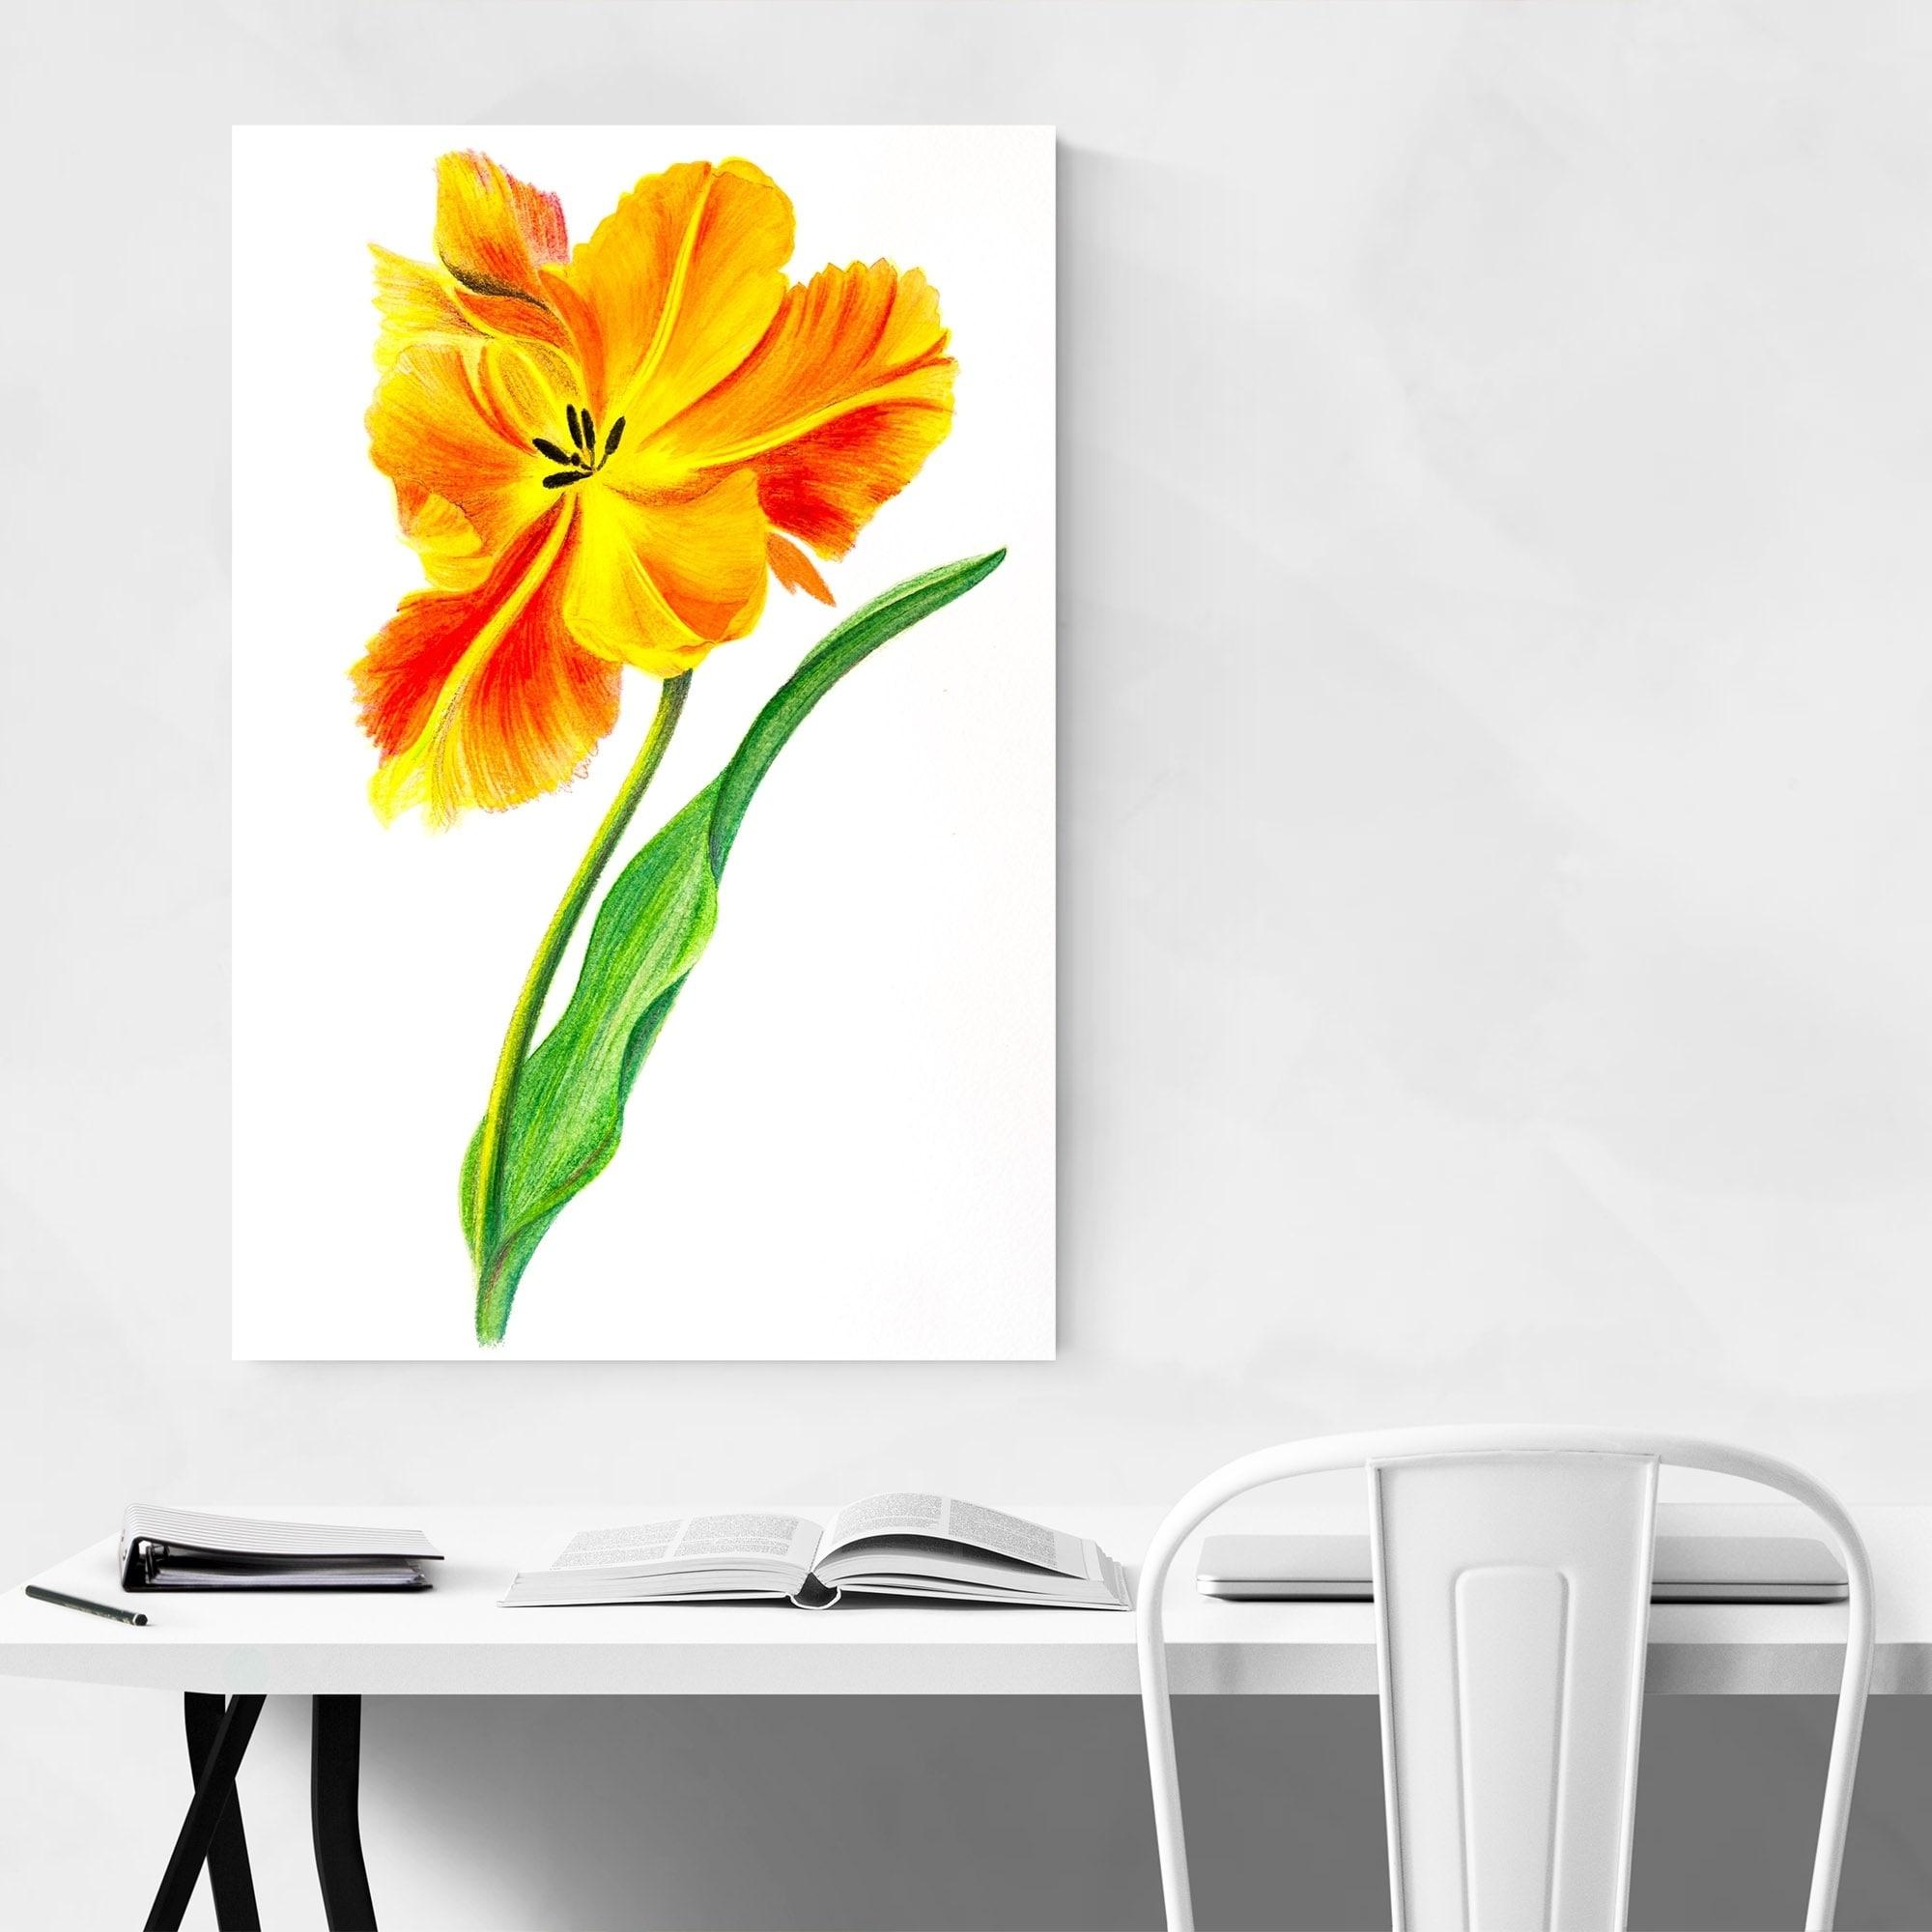 8 x 10 Inches Botanical Flower Illustration Unframed Hydrangea Print